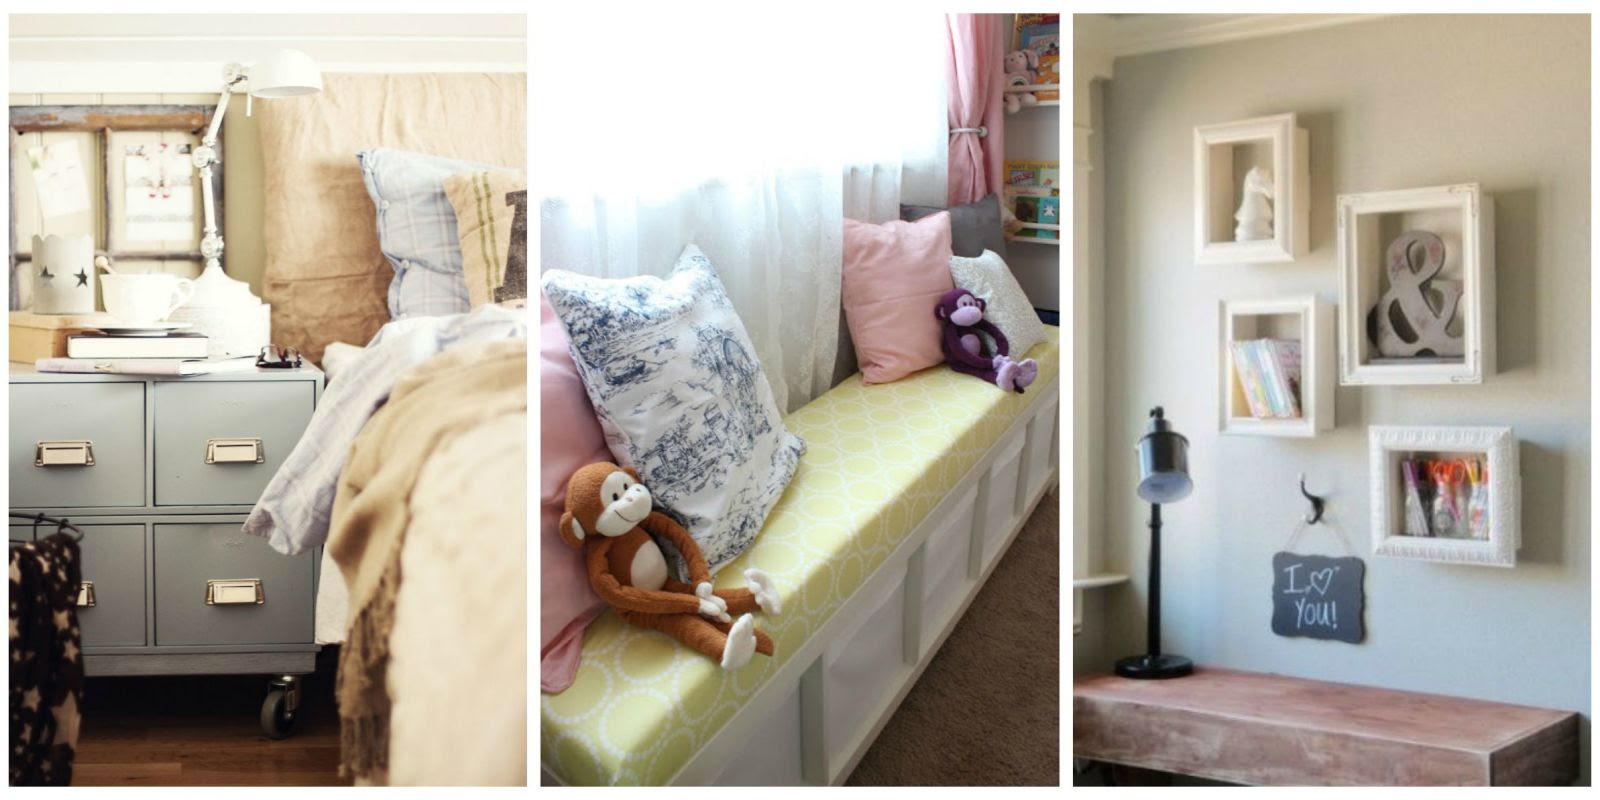 10 Best Bedroom Storage Ideas - Storage Ideas for Small ...